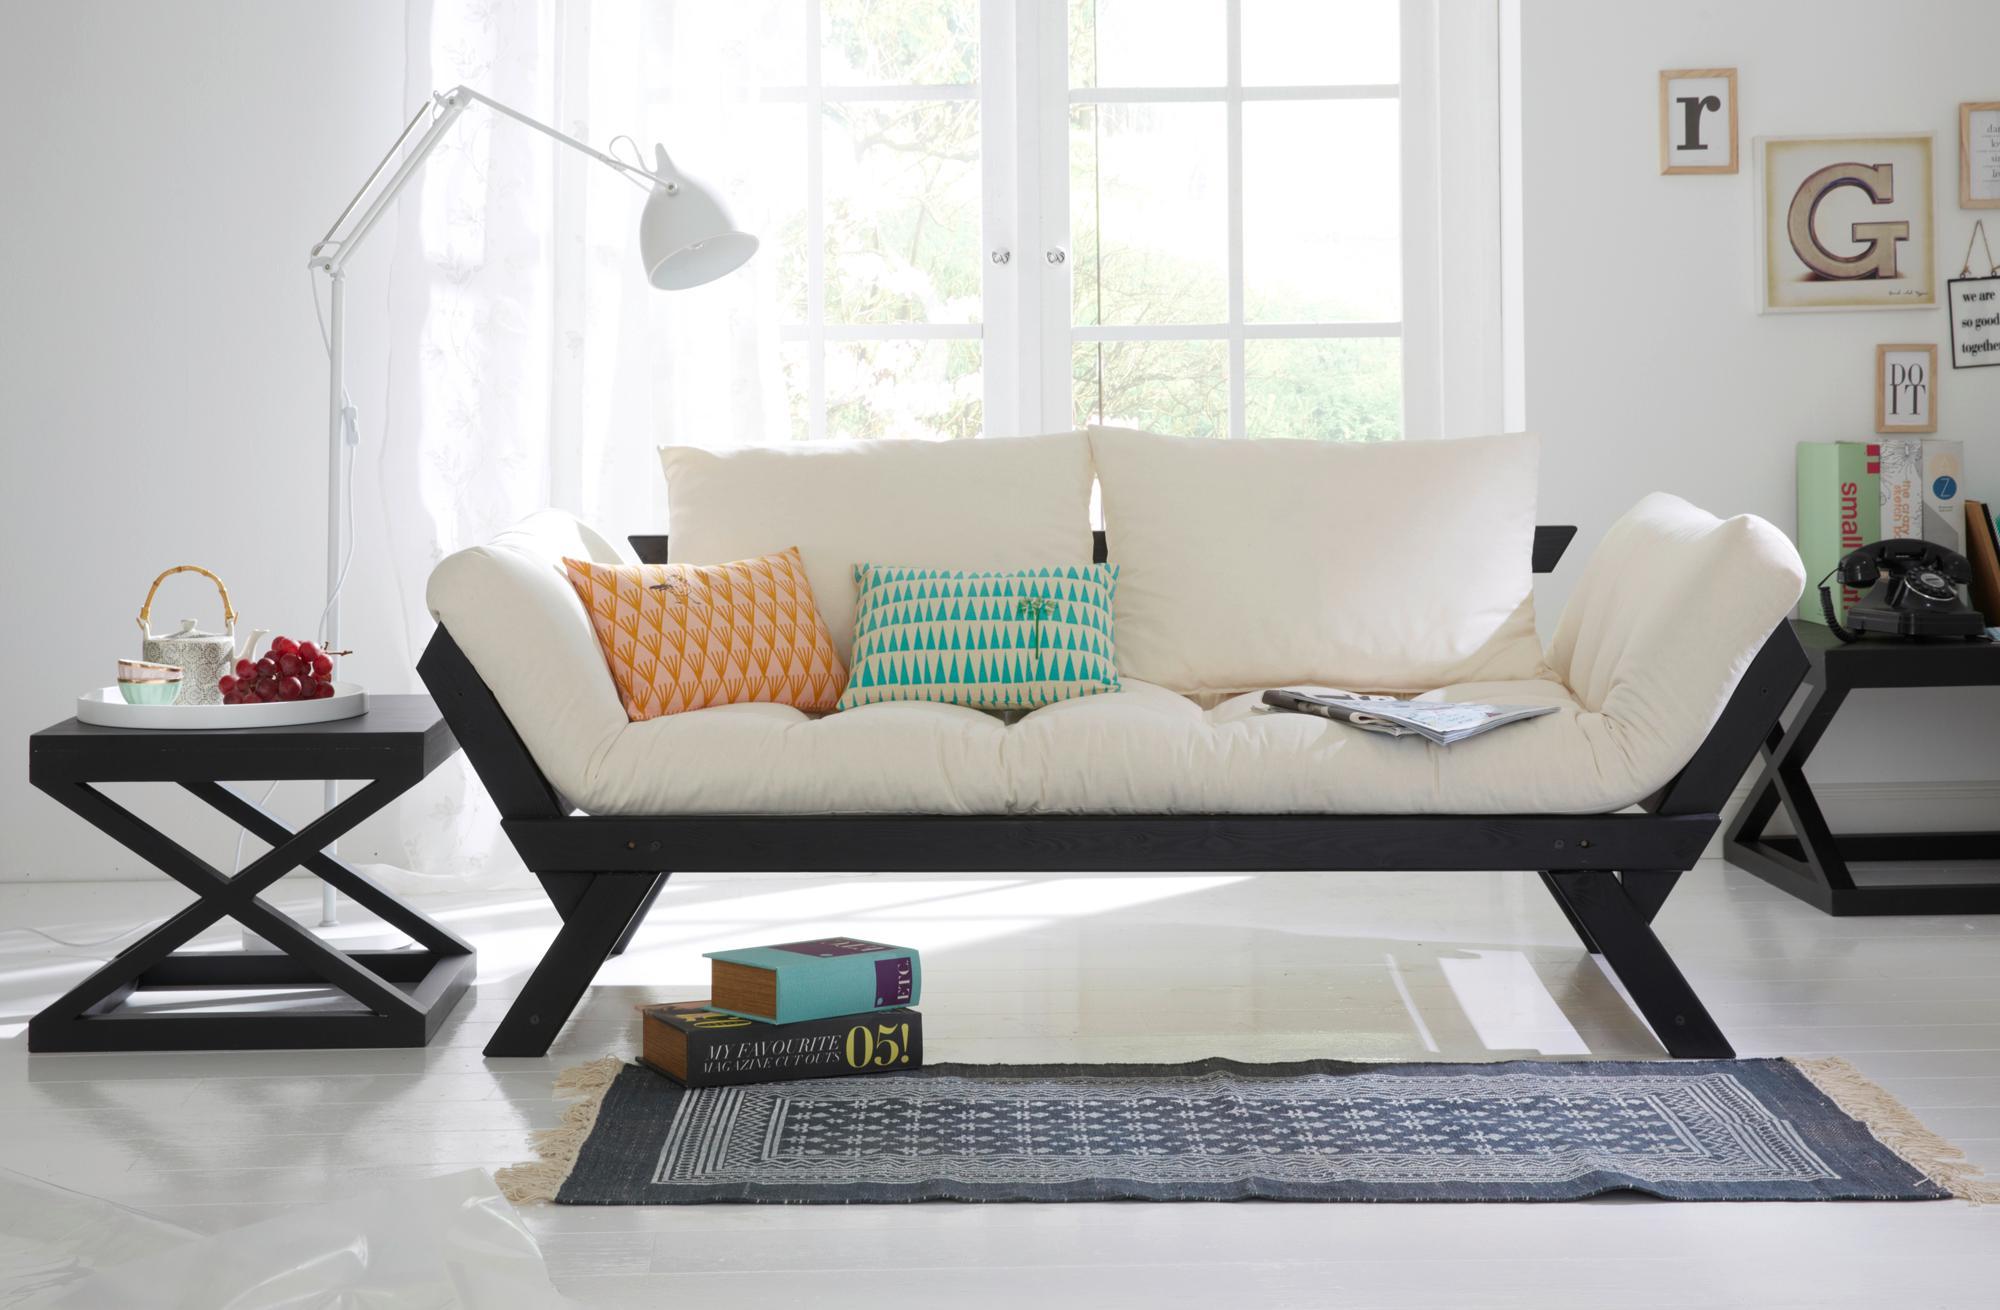 Car Selbstbaumöbel cremefarbenes sofa bilder ideen couchstyle